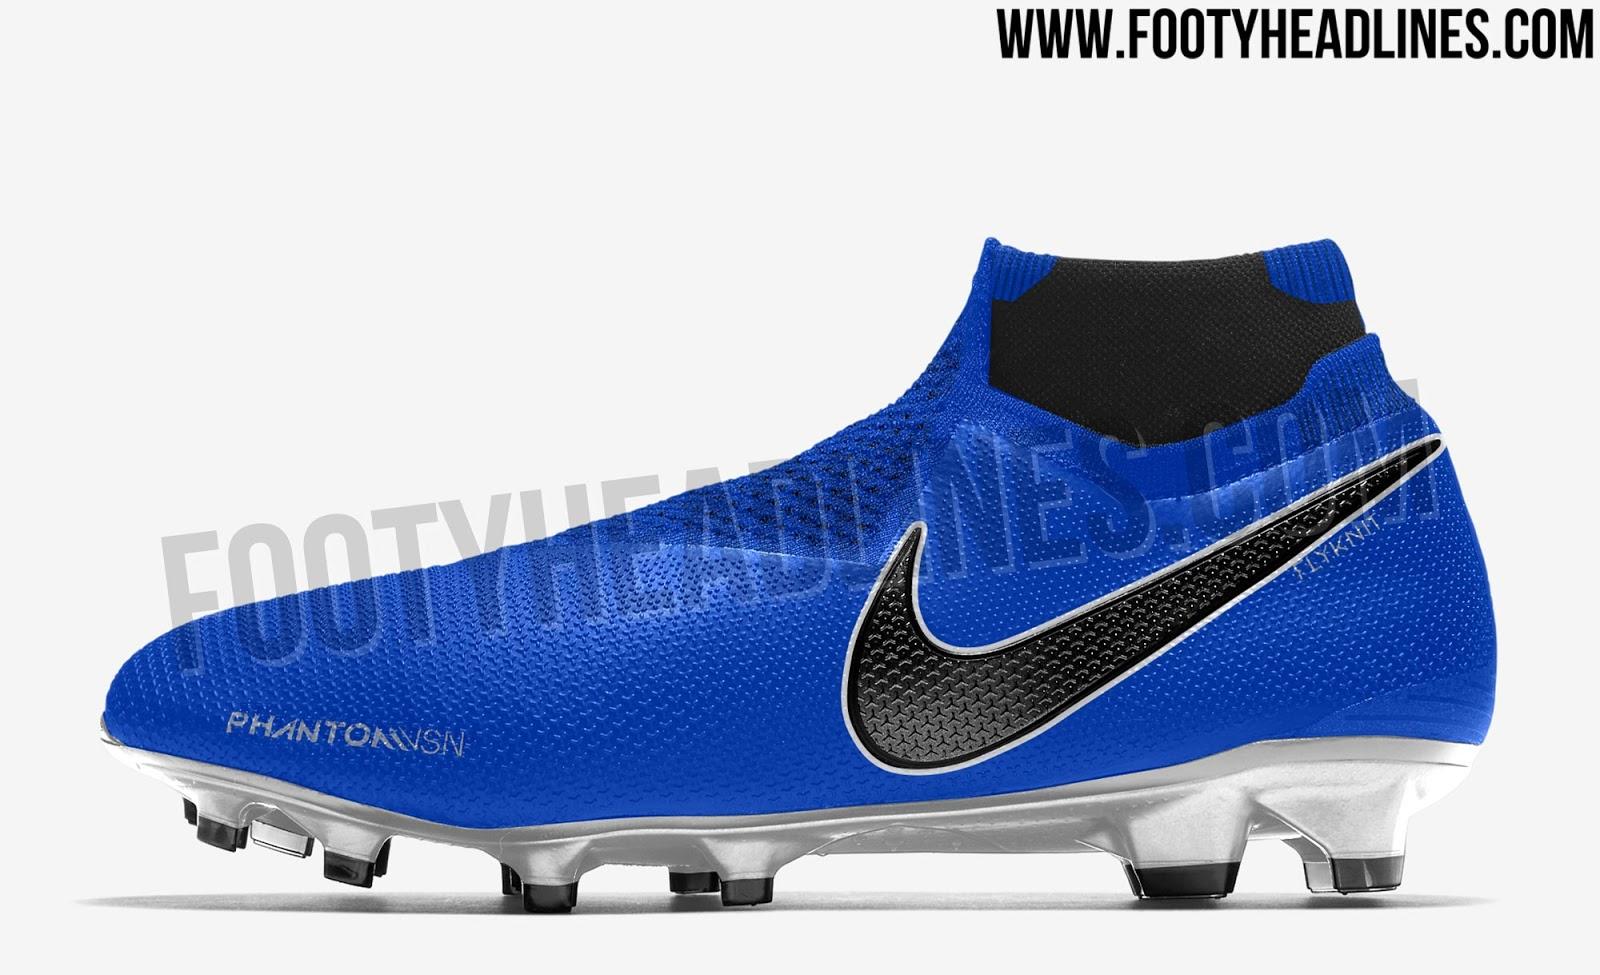 Blue   Black   Silver Nike Phantom Vision 2018-2019 Boots Leaked 40c924c8143